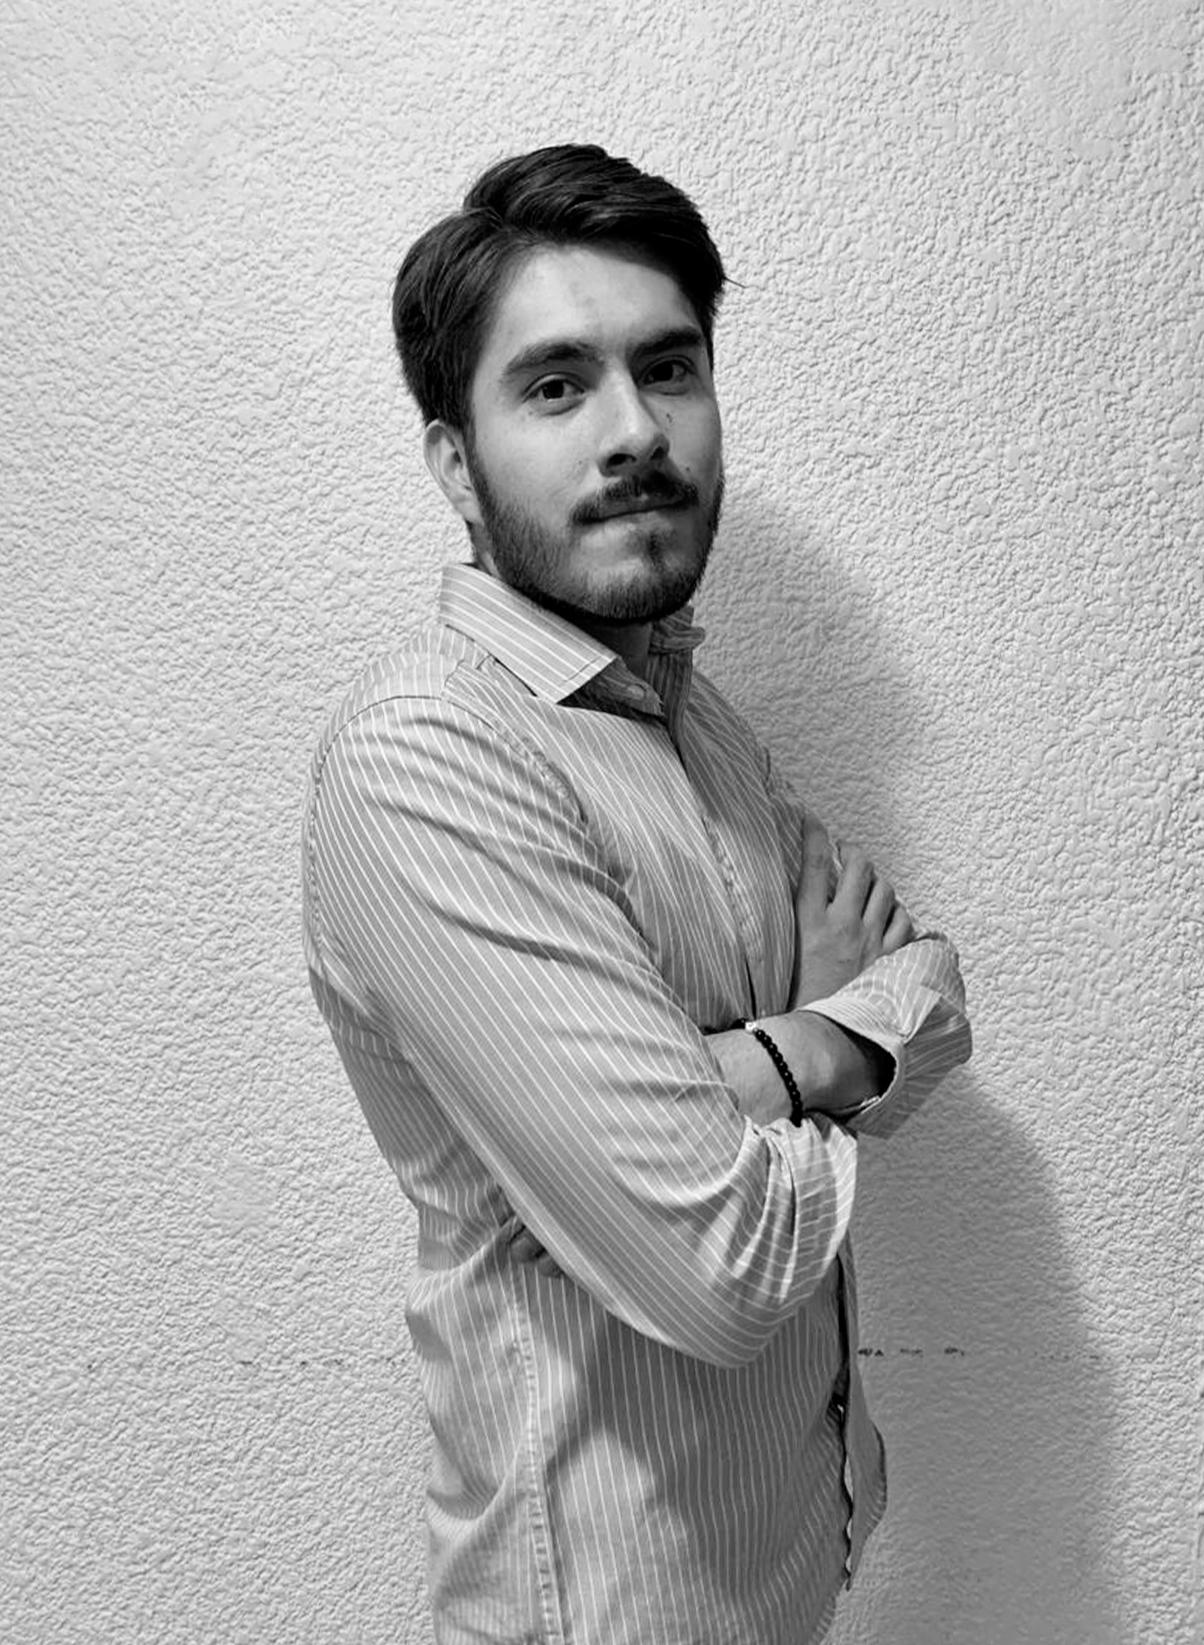 Marlon Minimalist Agency